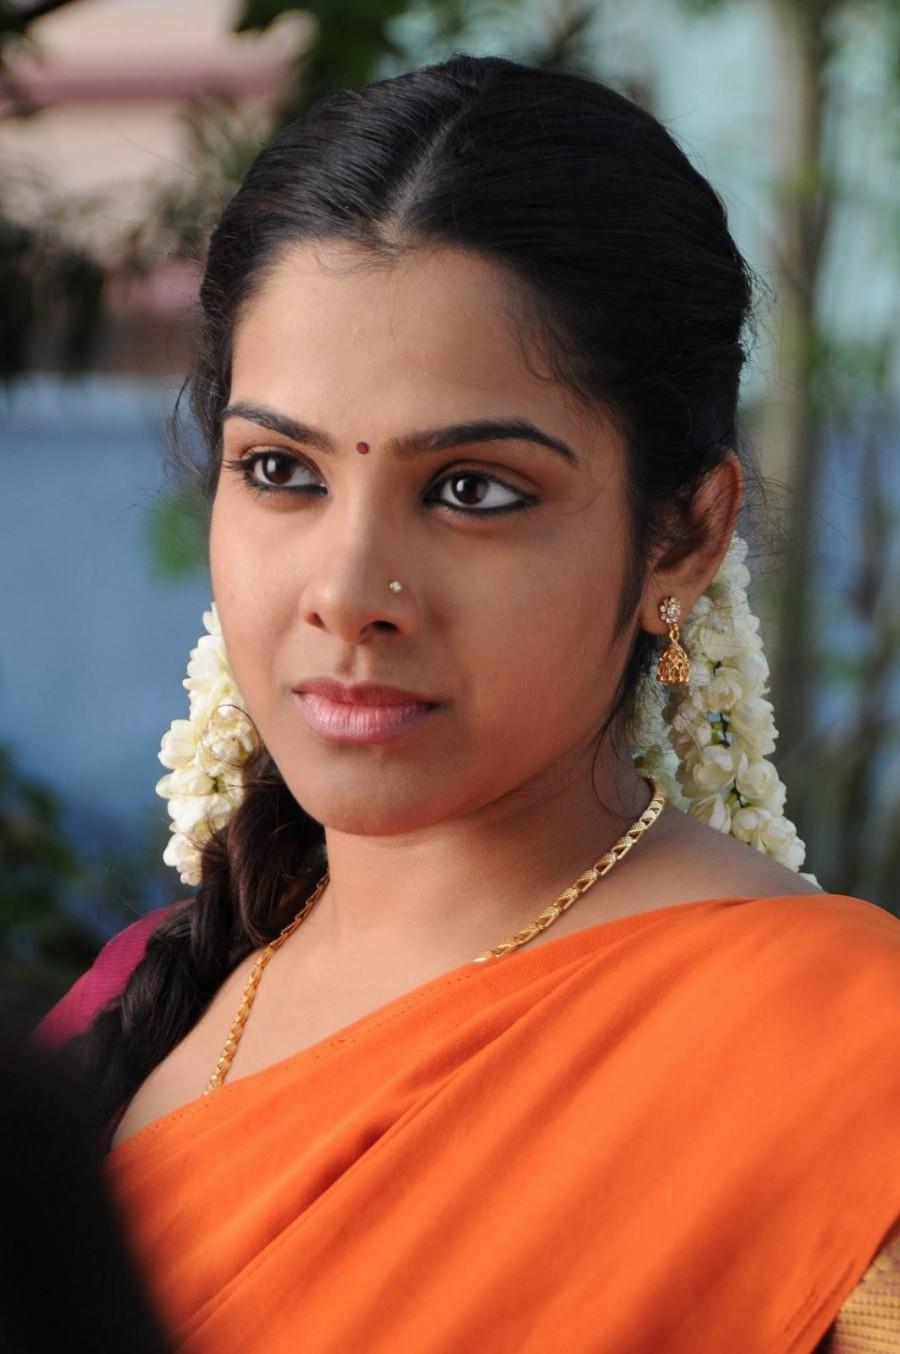 Sandhya,Tamil Actress Sandhya,Actress Sandhya,Sandhya Pics,Sandhya Pictures,Sandhya Photos,Sandhya Still,Sandhya Images,South Indian Actress Sandhya,Sandhya Hot Pics